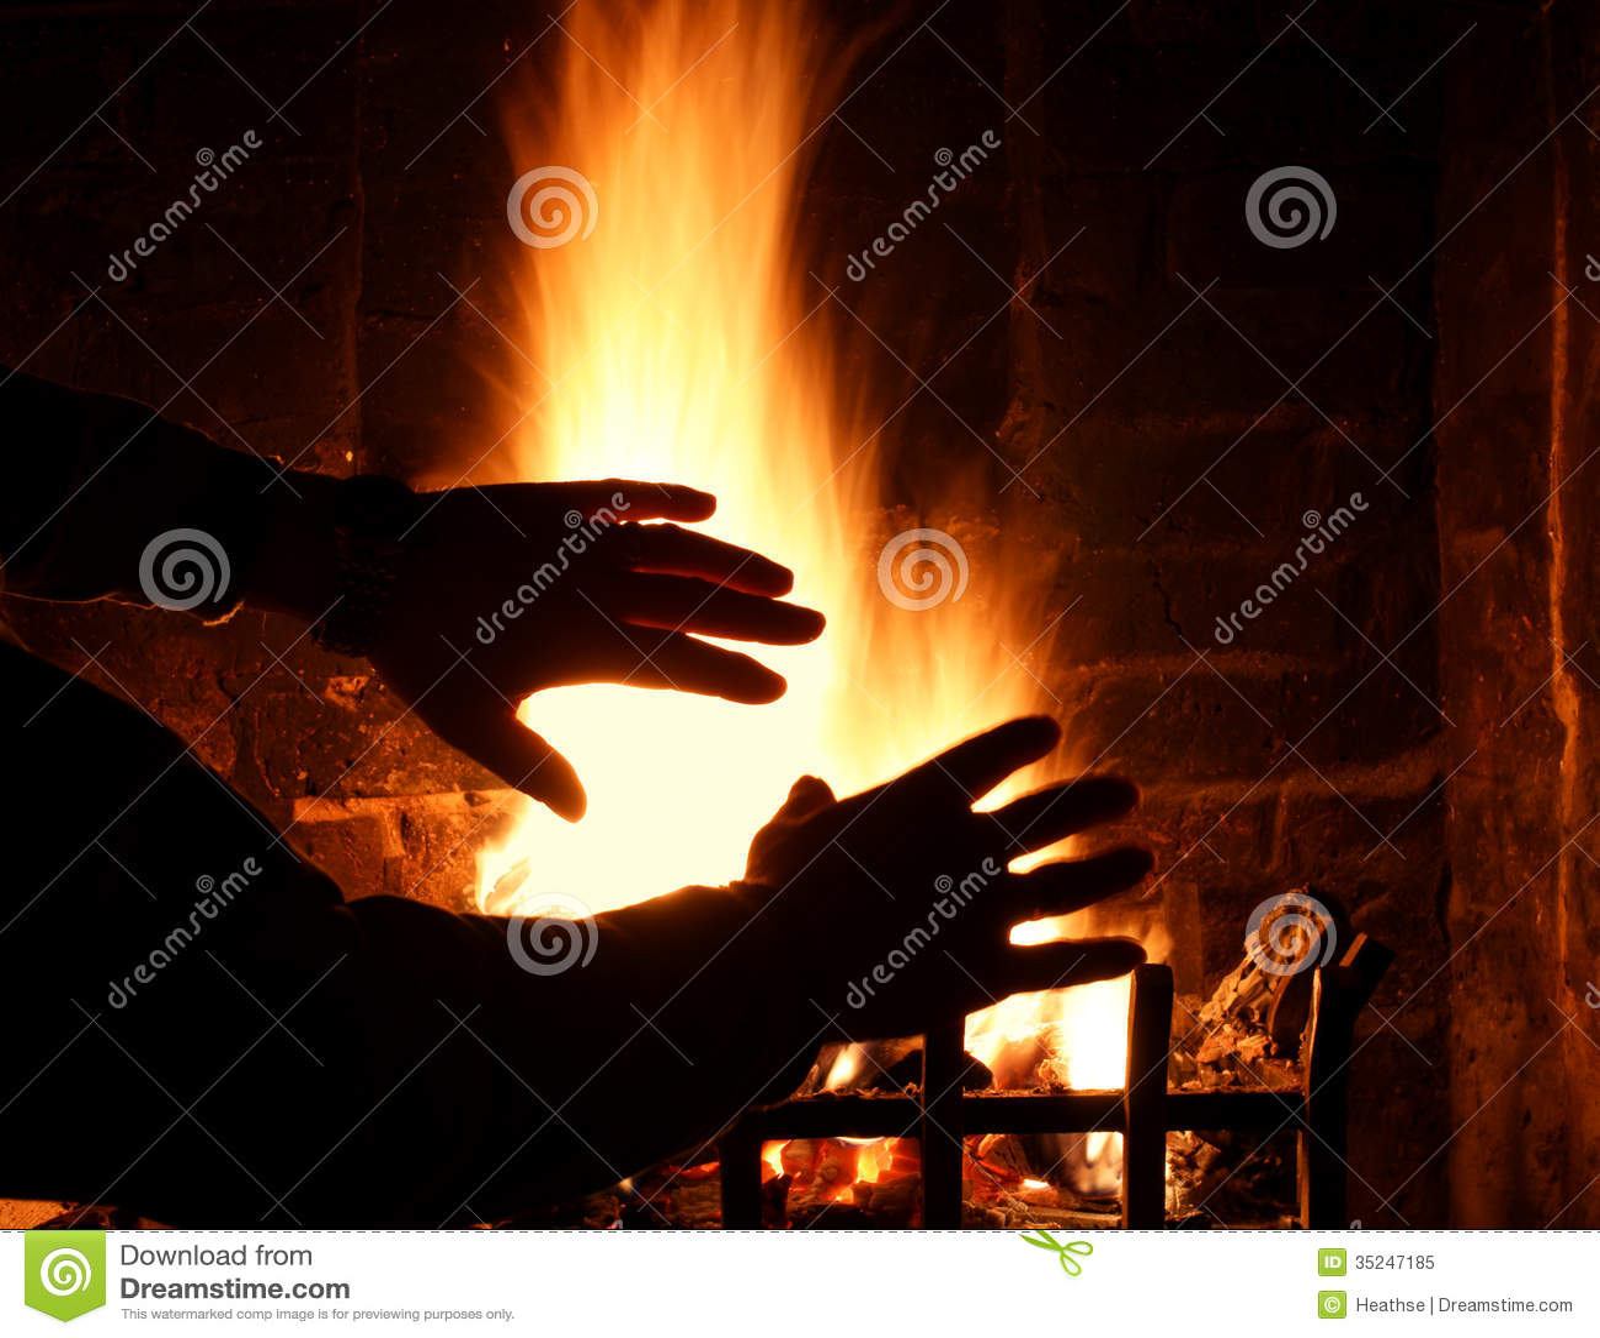 Firelight Royalty Free Stock Photo   Image  35247185